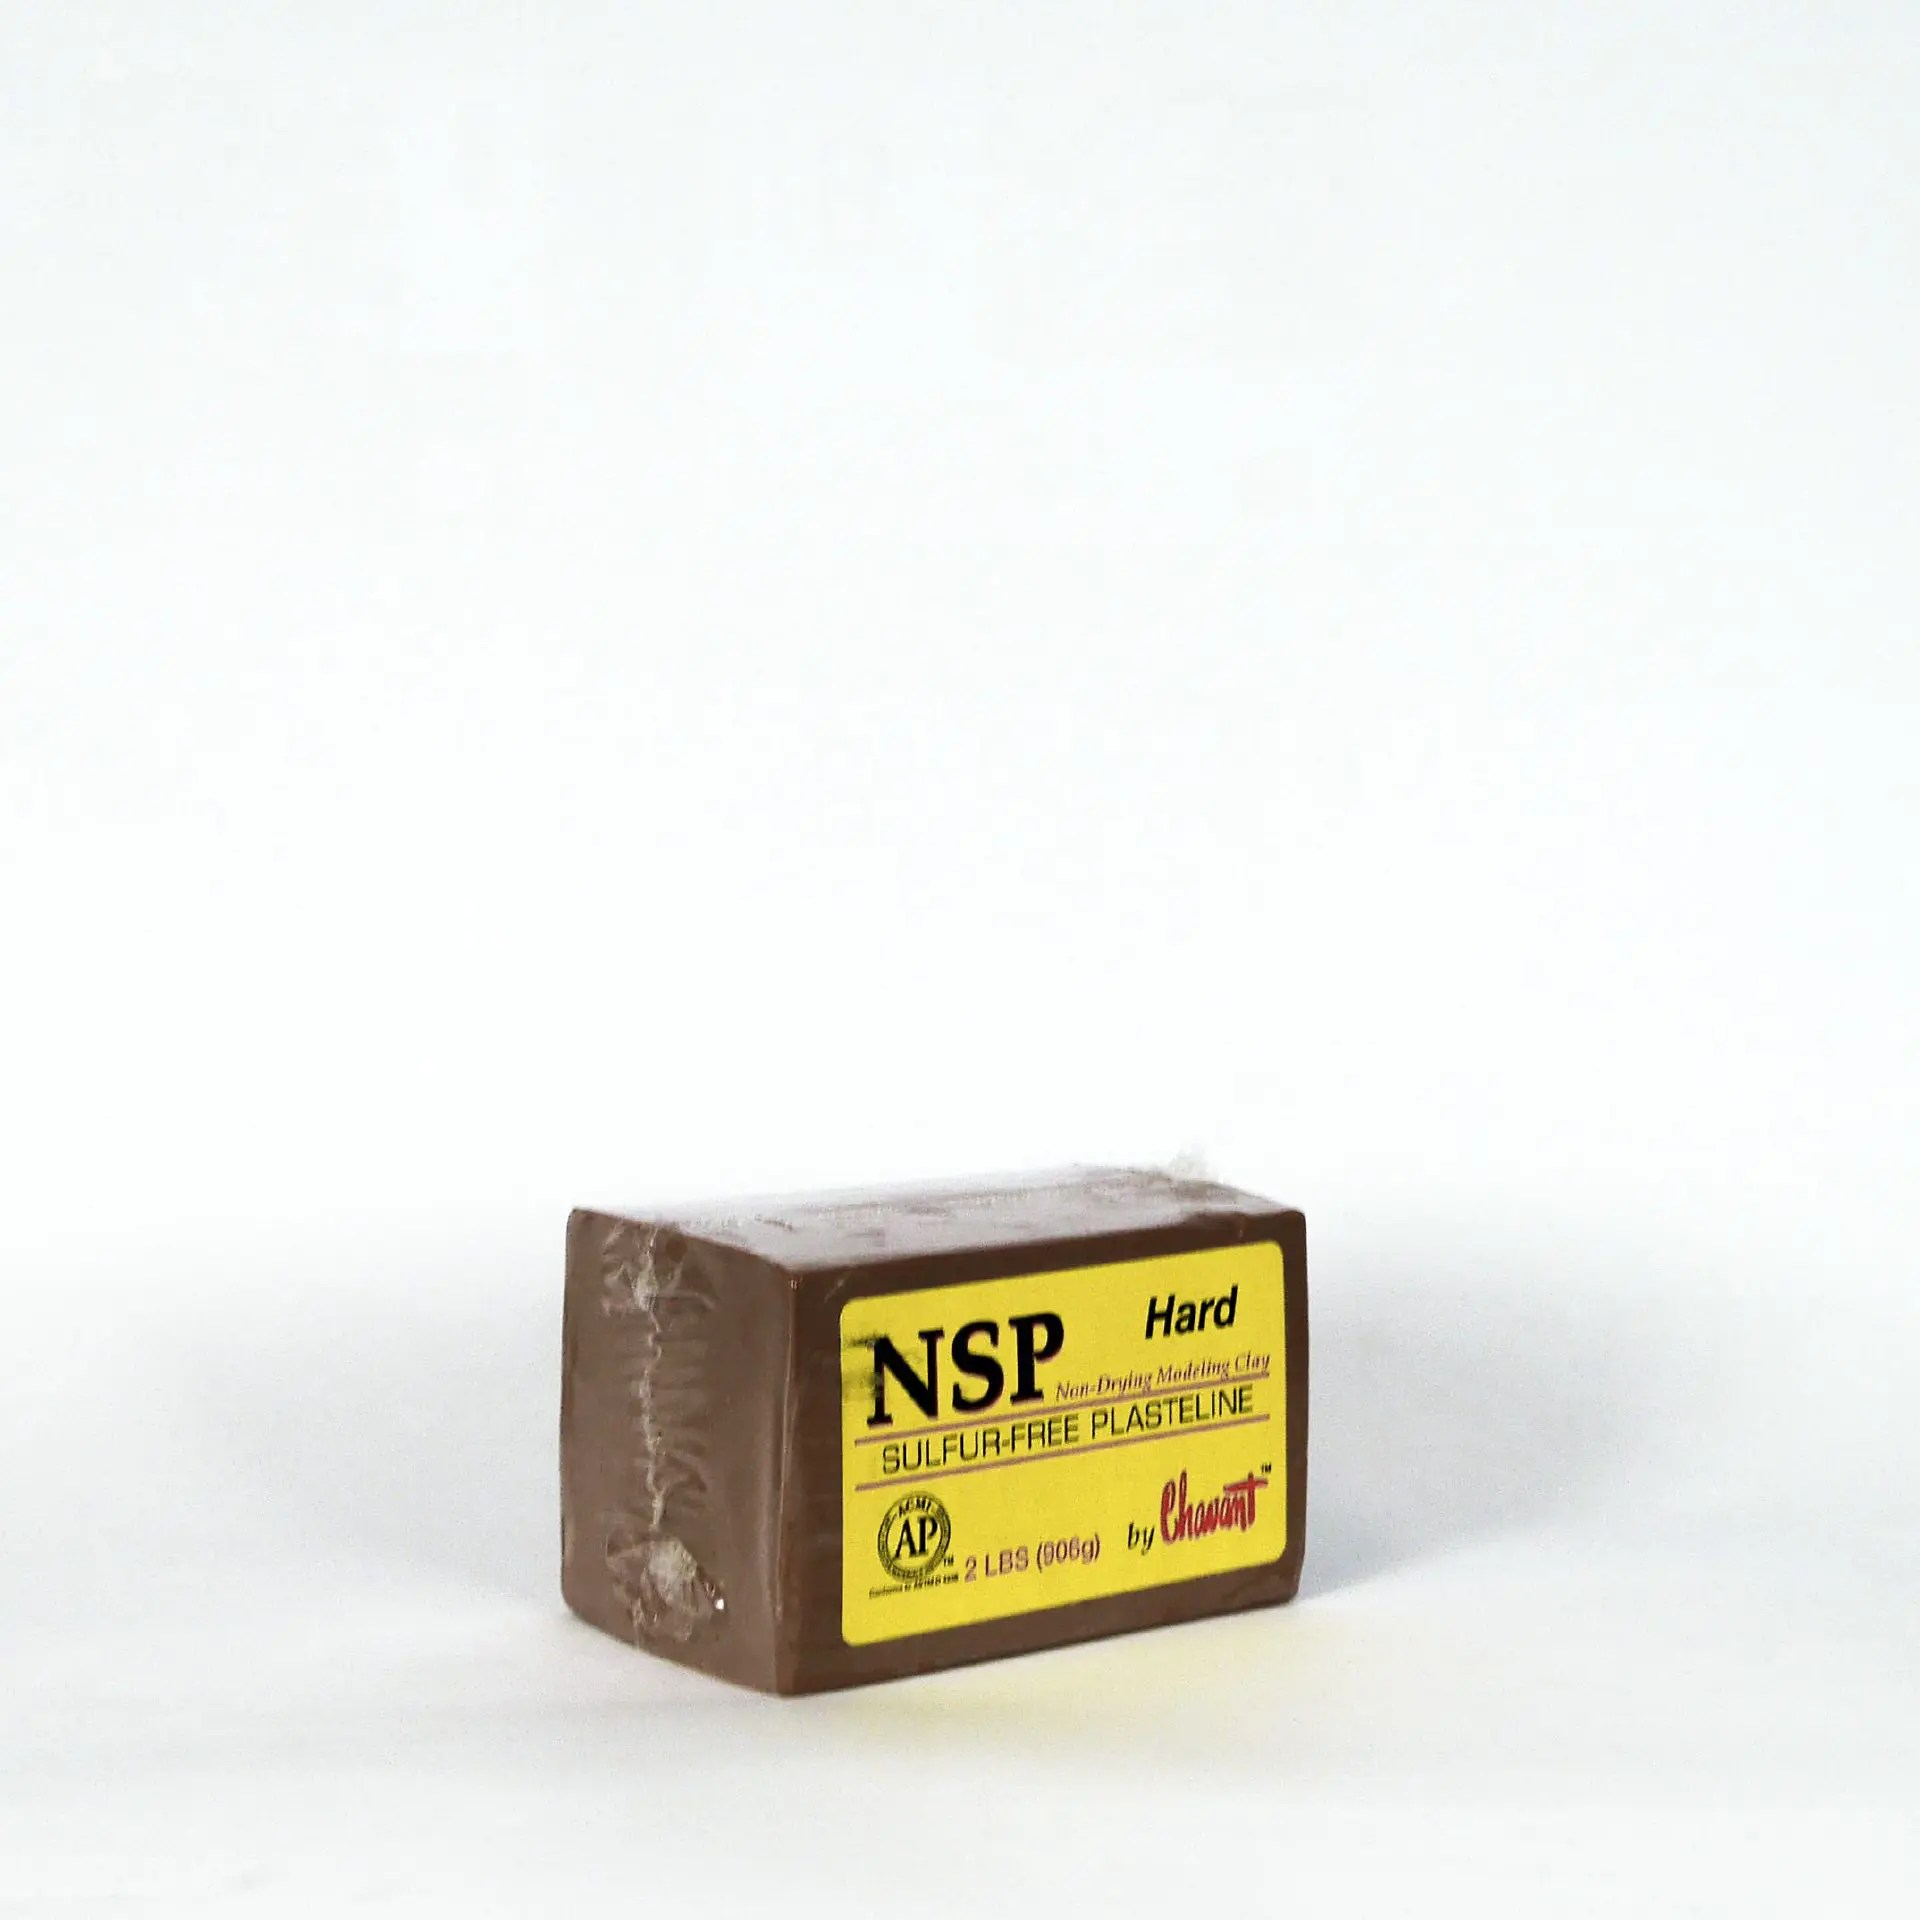 Chavant Clay NSP Medium Tan Sculpting and Modeling Clay 2lb Block SFX Makeup